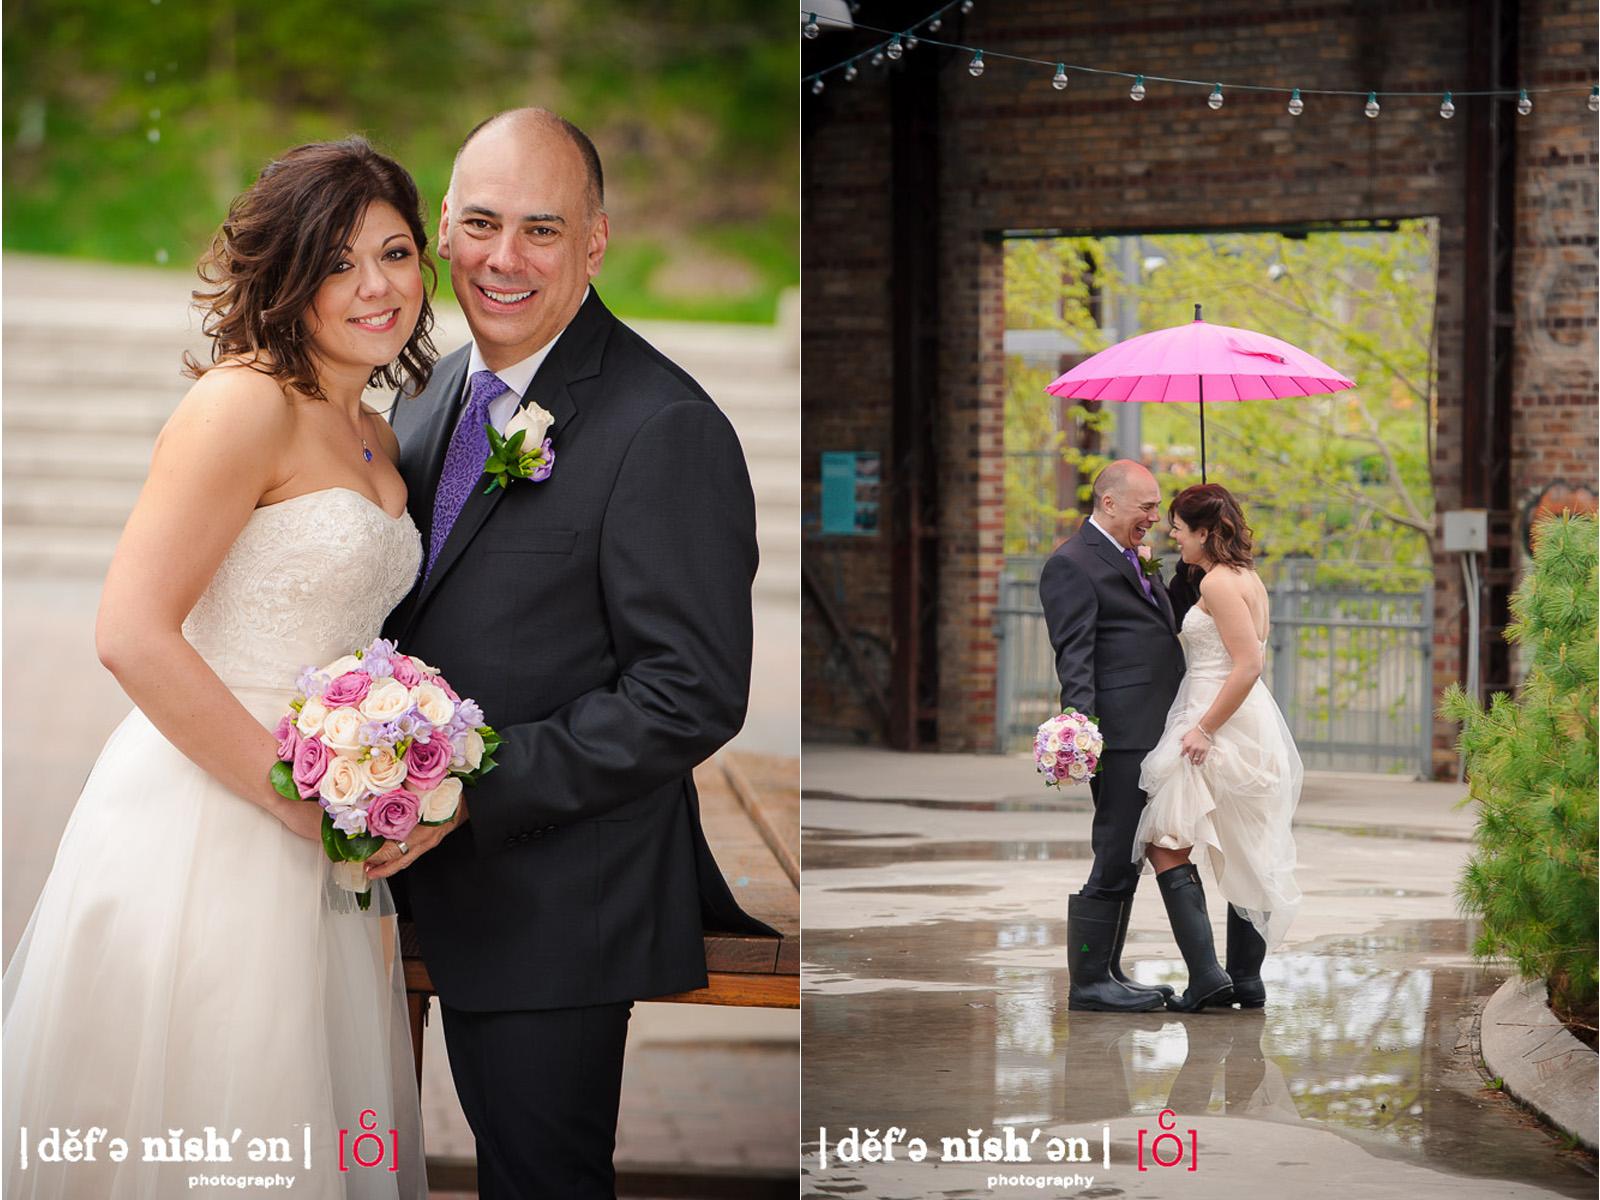 Definition Photography Weddings Globe Danforth-1013.jpg